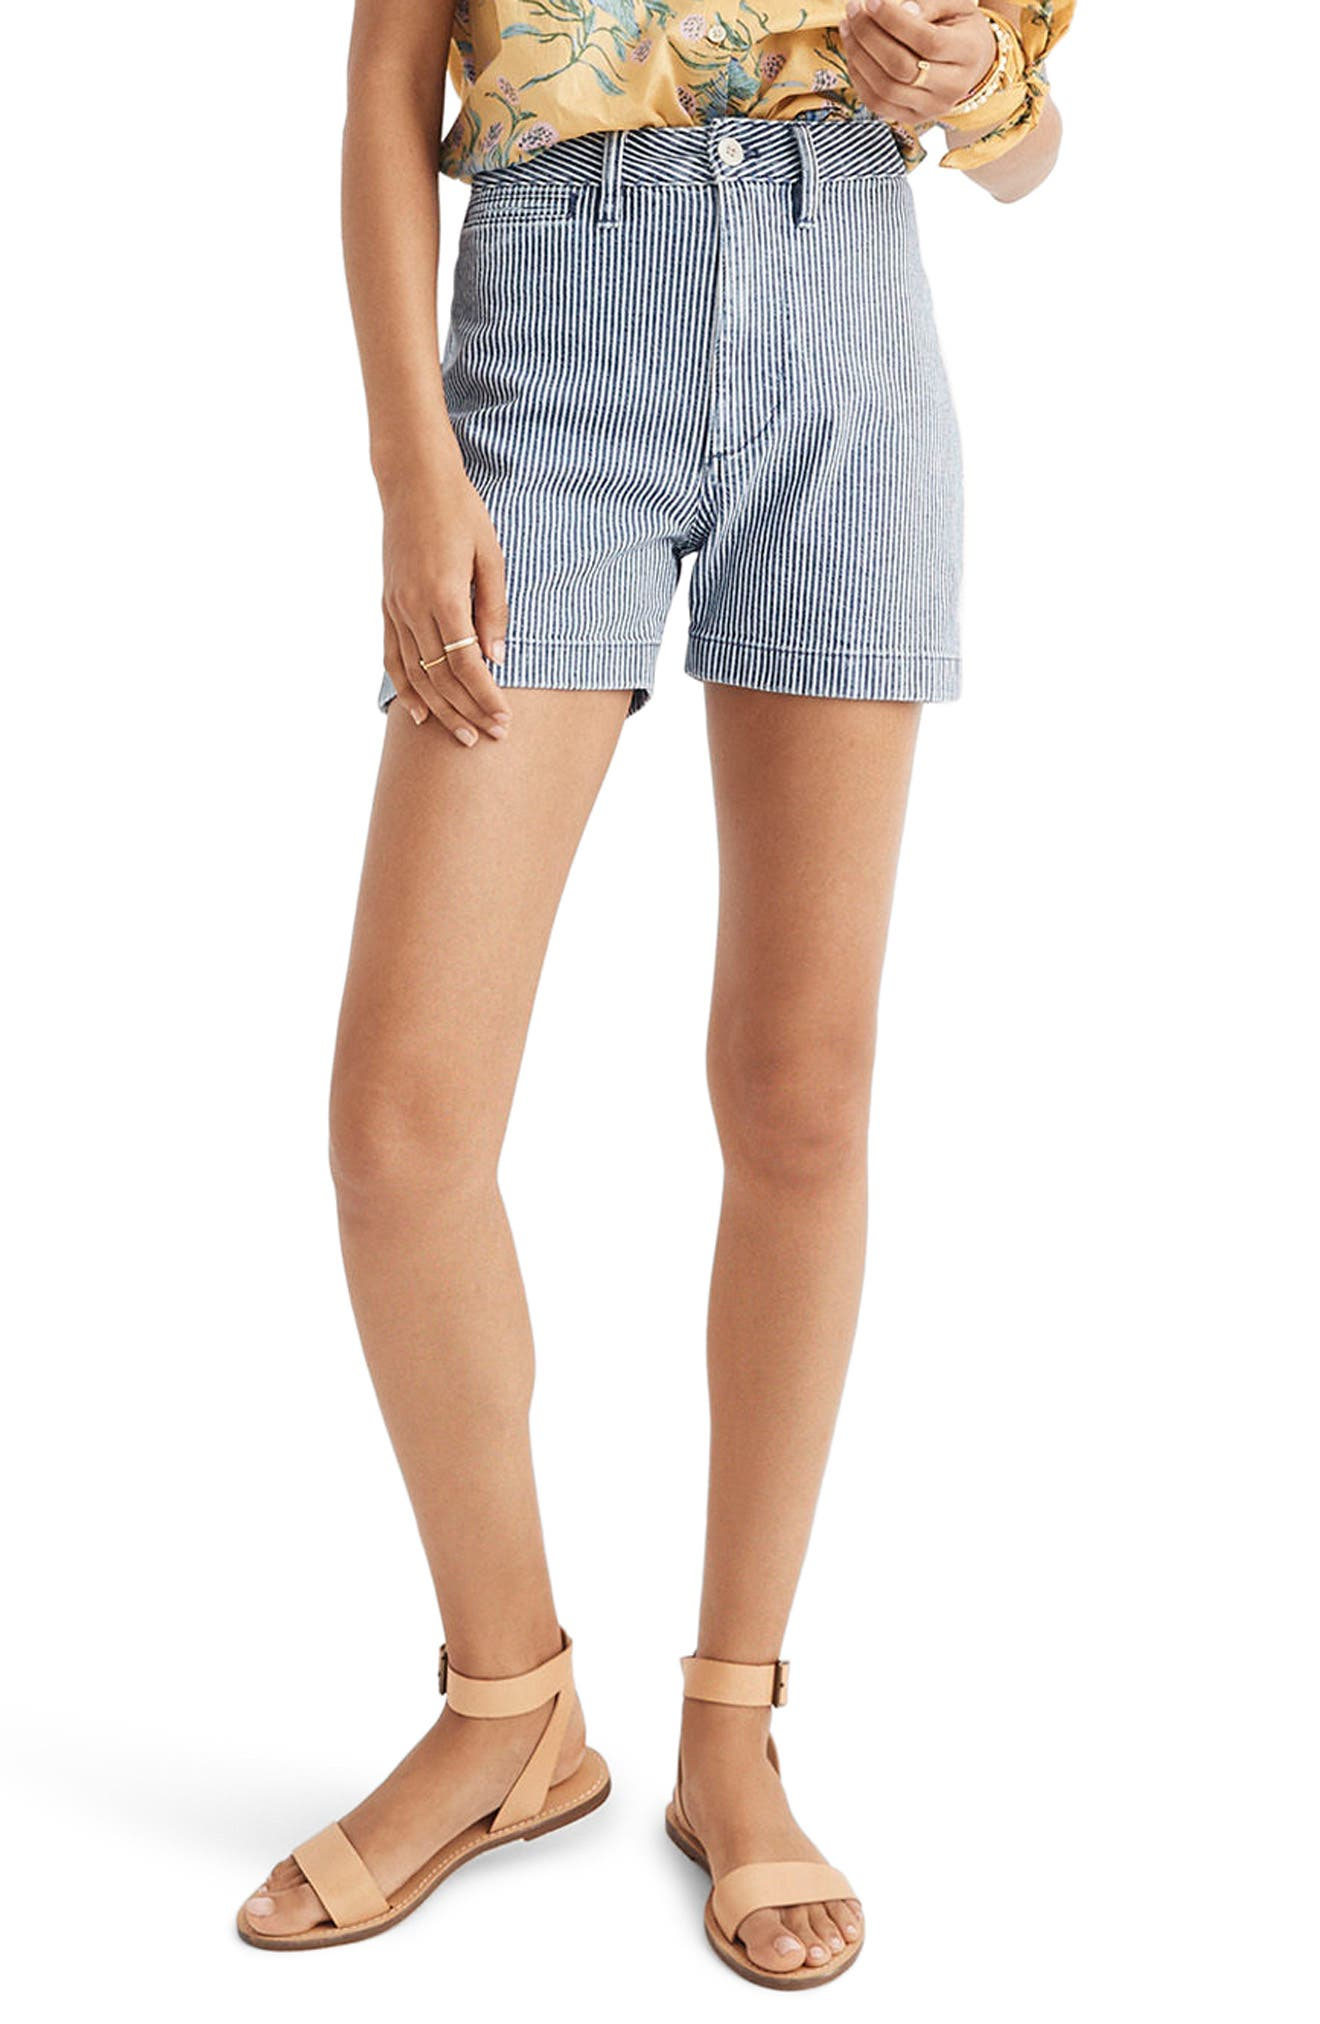 Emmett Stripe Denim Shorts,                             Main thumbnail 1, color,                             Piper Stripe